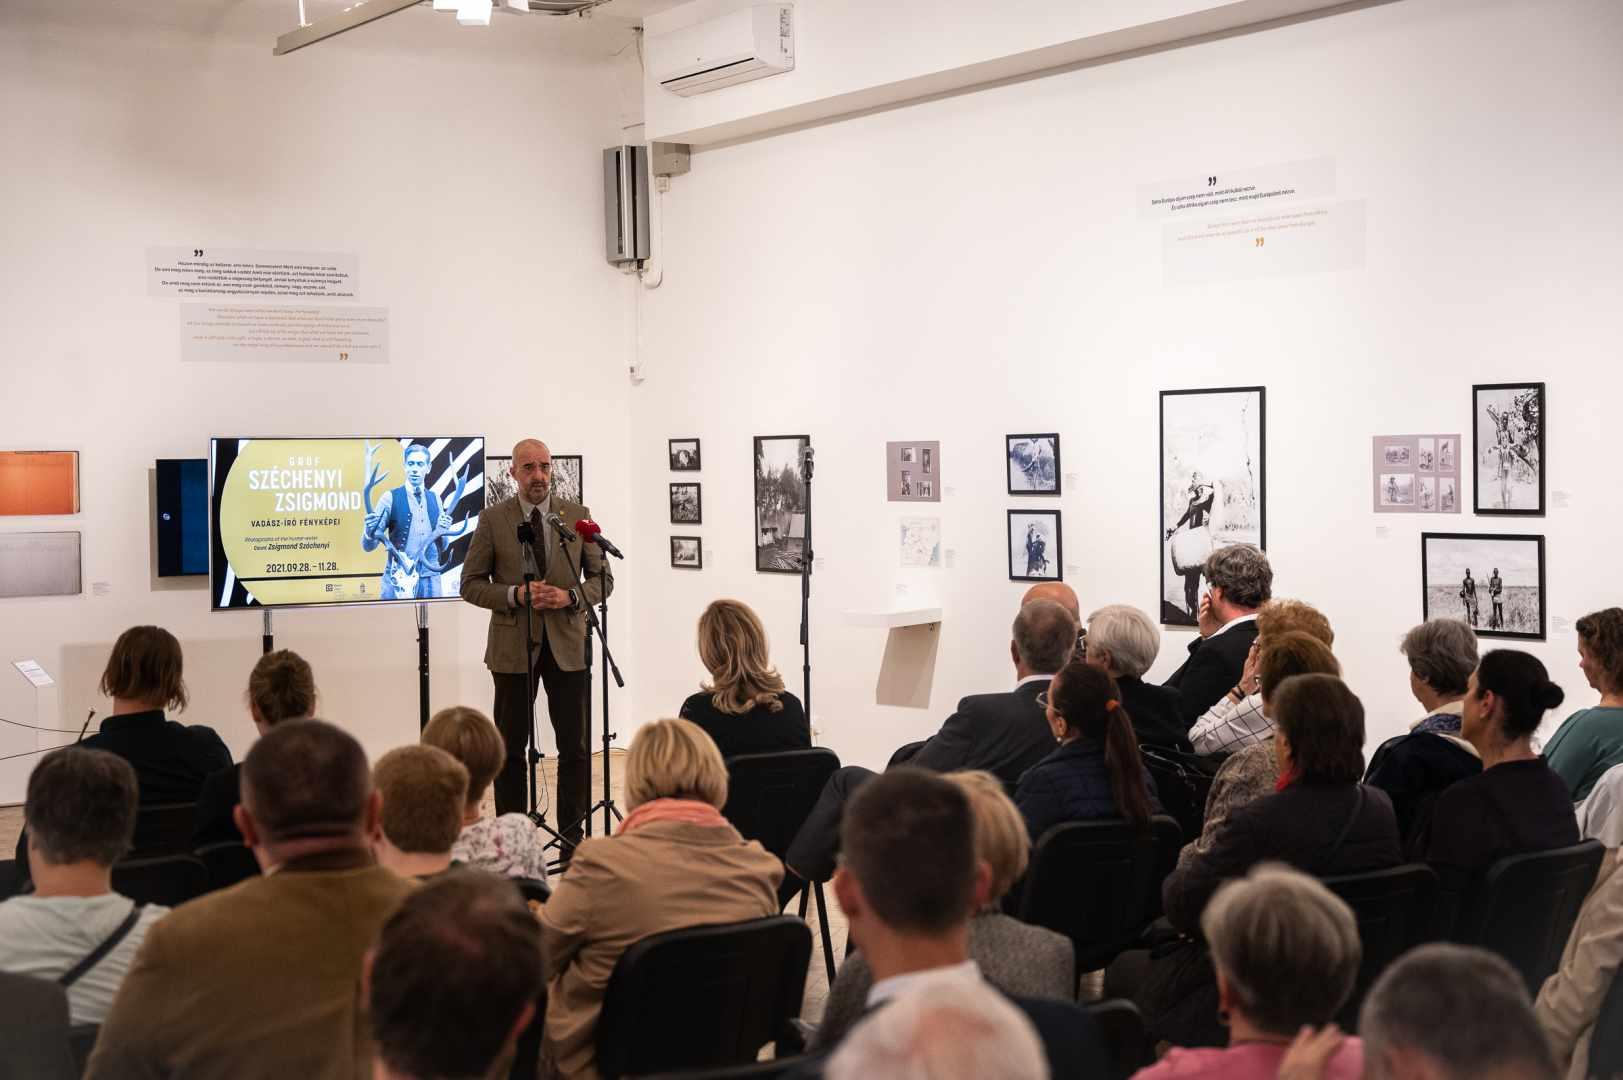 Exhibition of Zsigmond Széchenyi's photos opens in Capa Centre